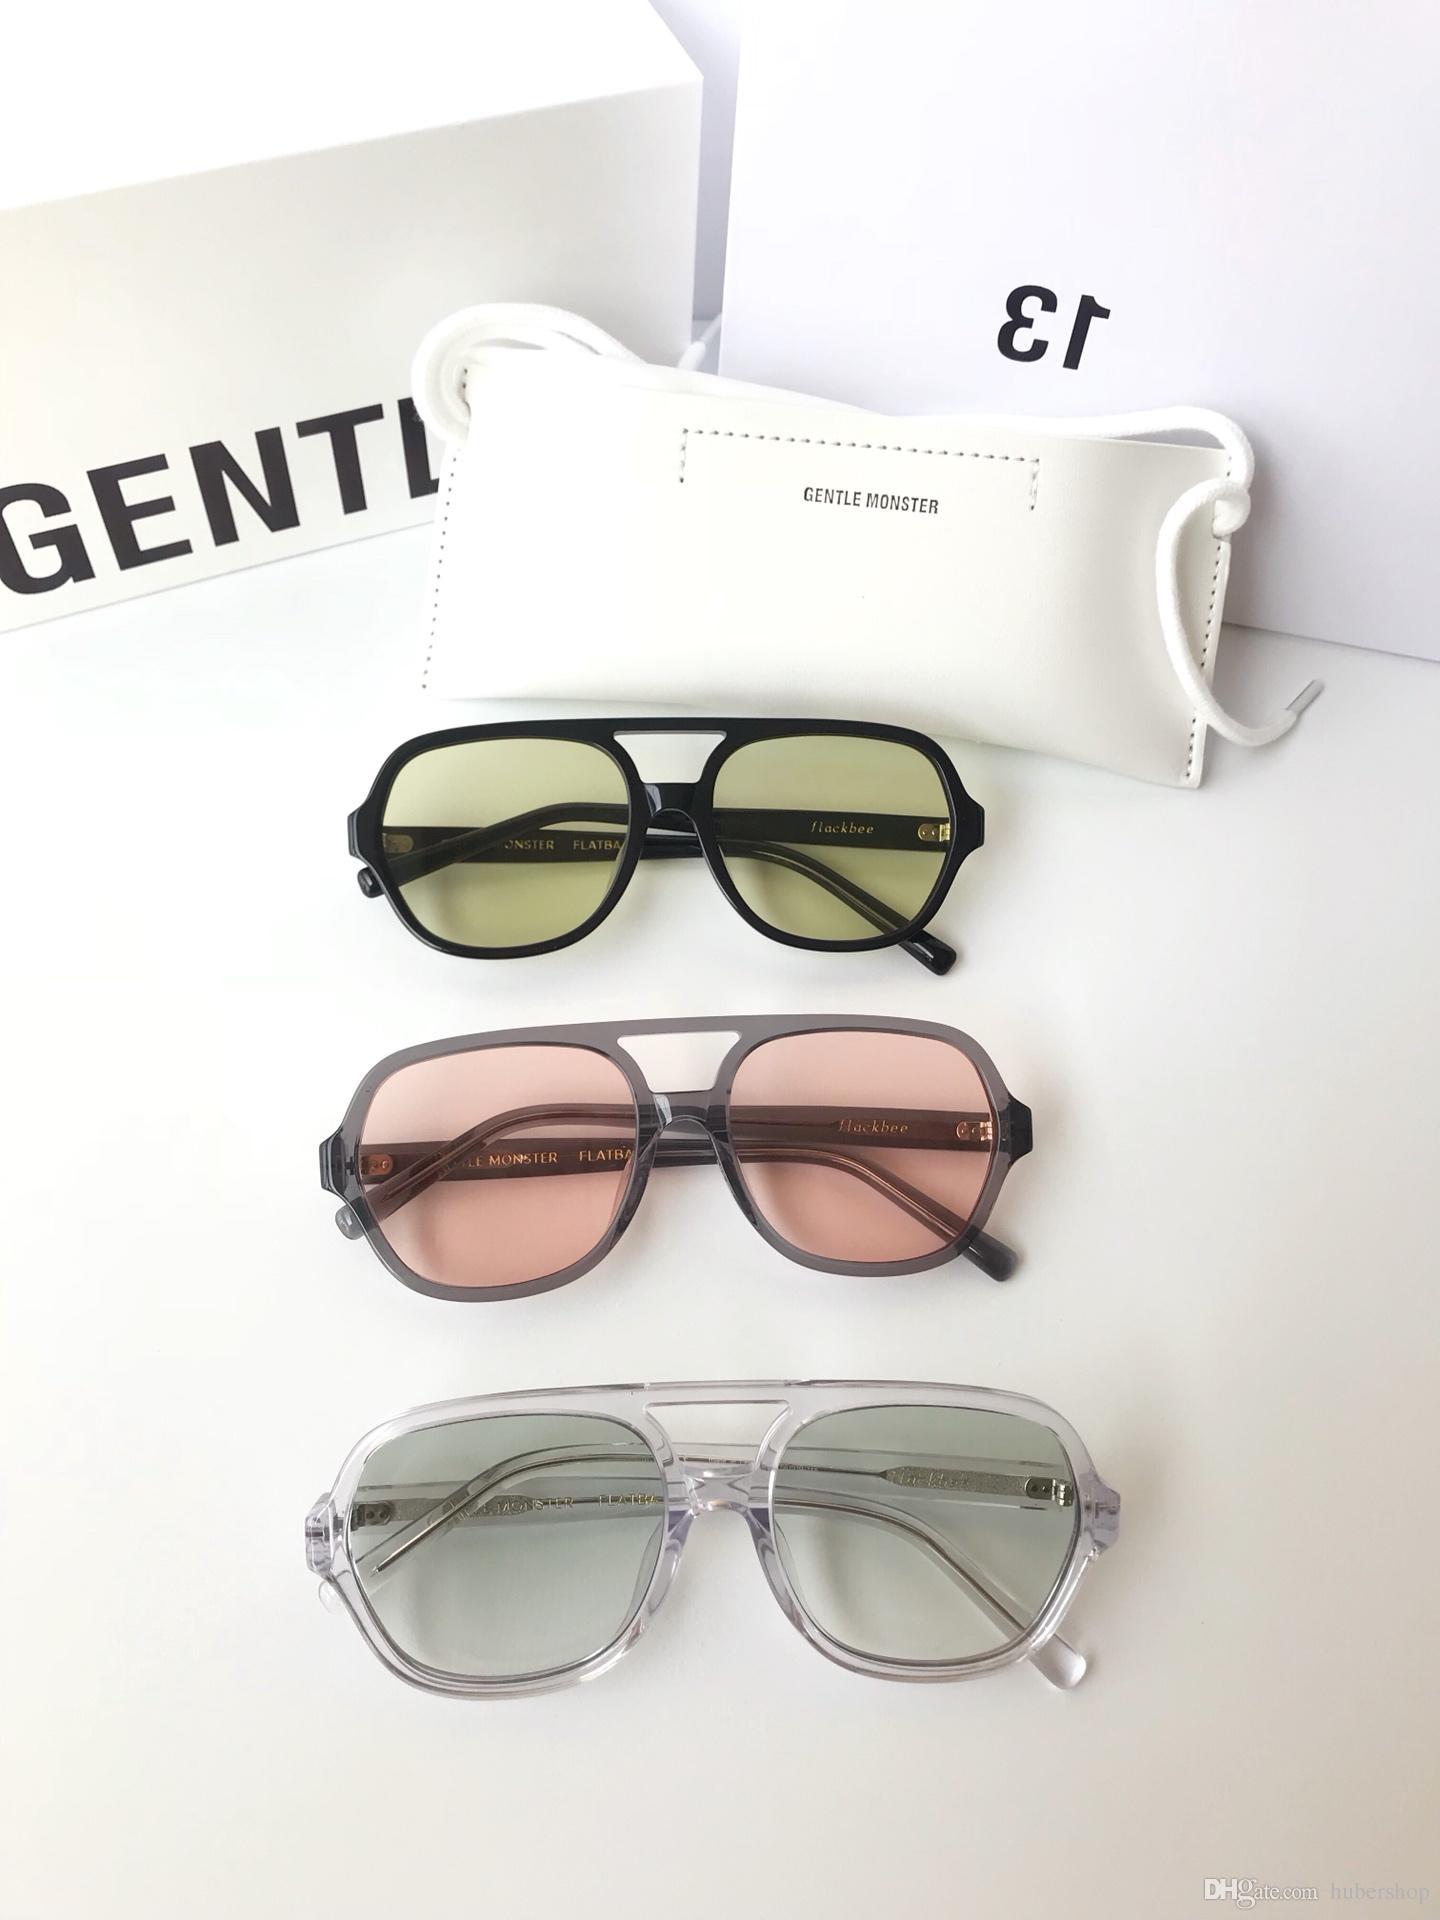 2019 Hot Sale Korea Famous Designer Sunglasses GM FLACKBEE Fashion Unisex Sunglasses for men and women UV400 Sunglasses with box